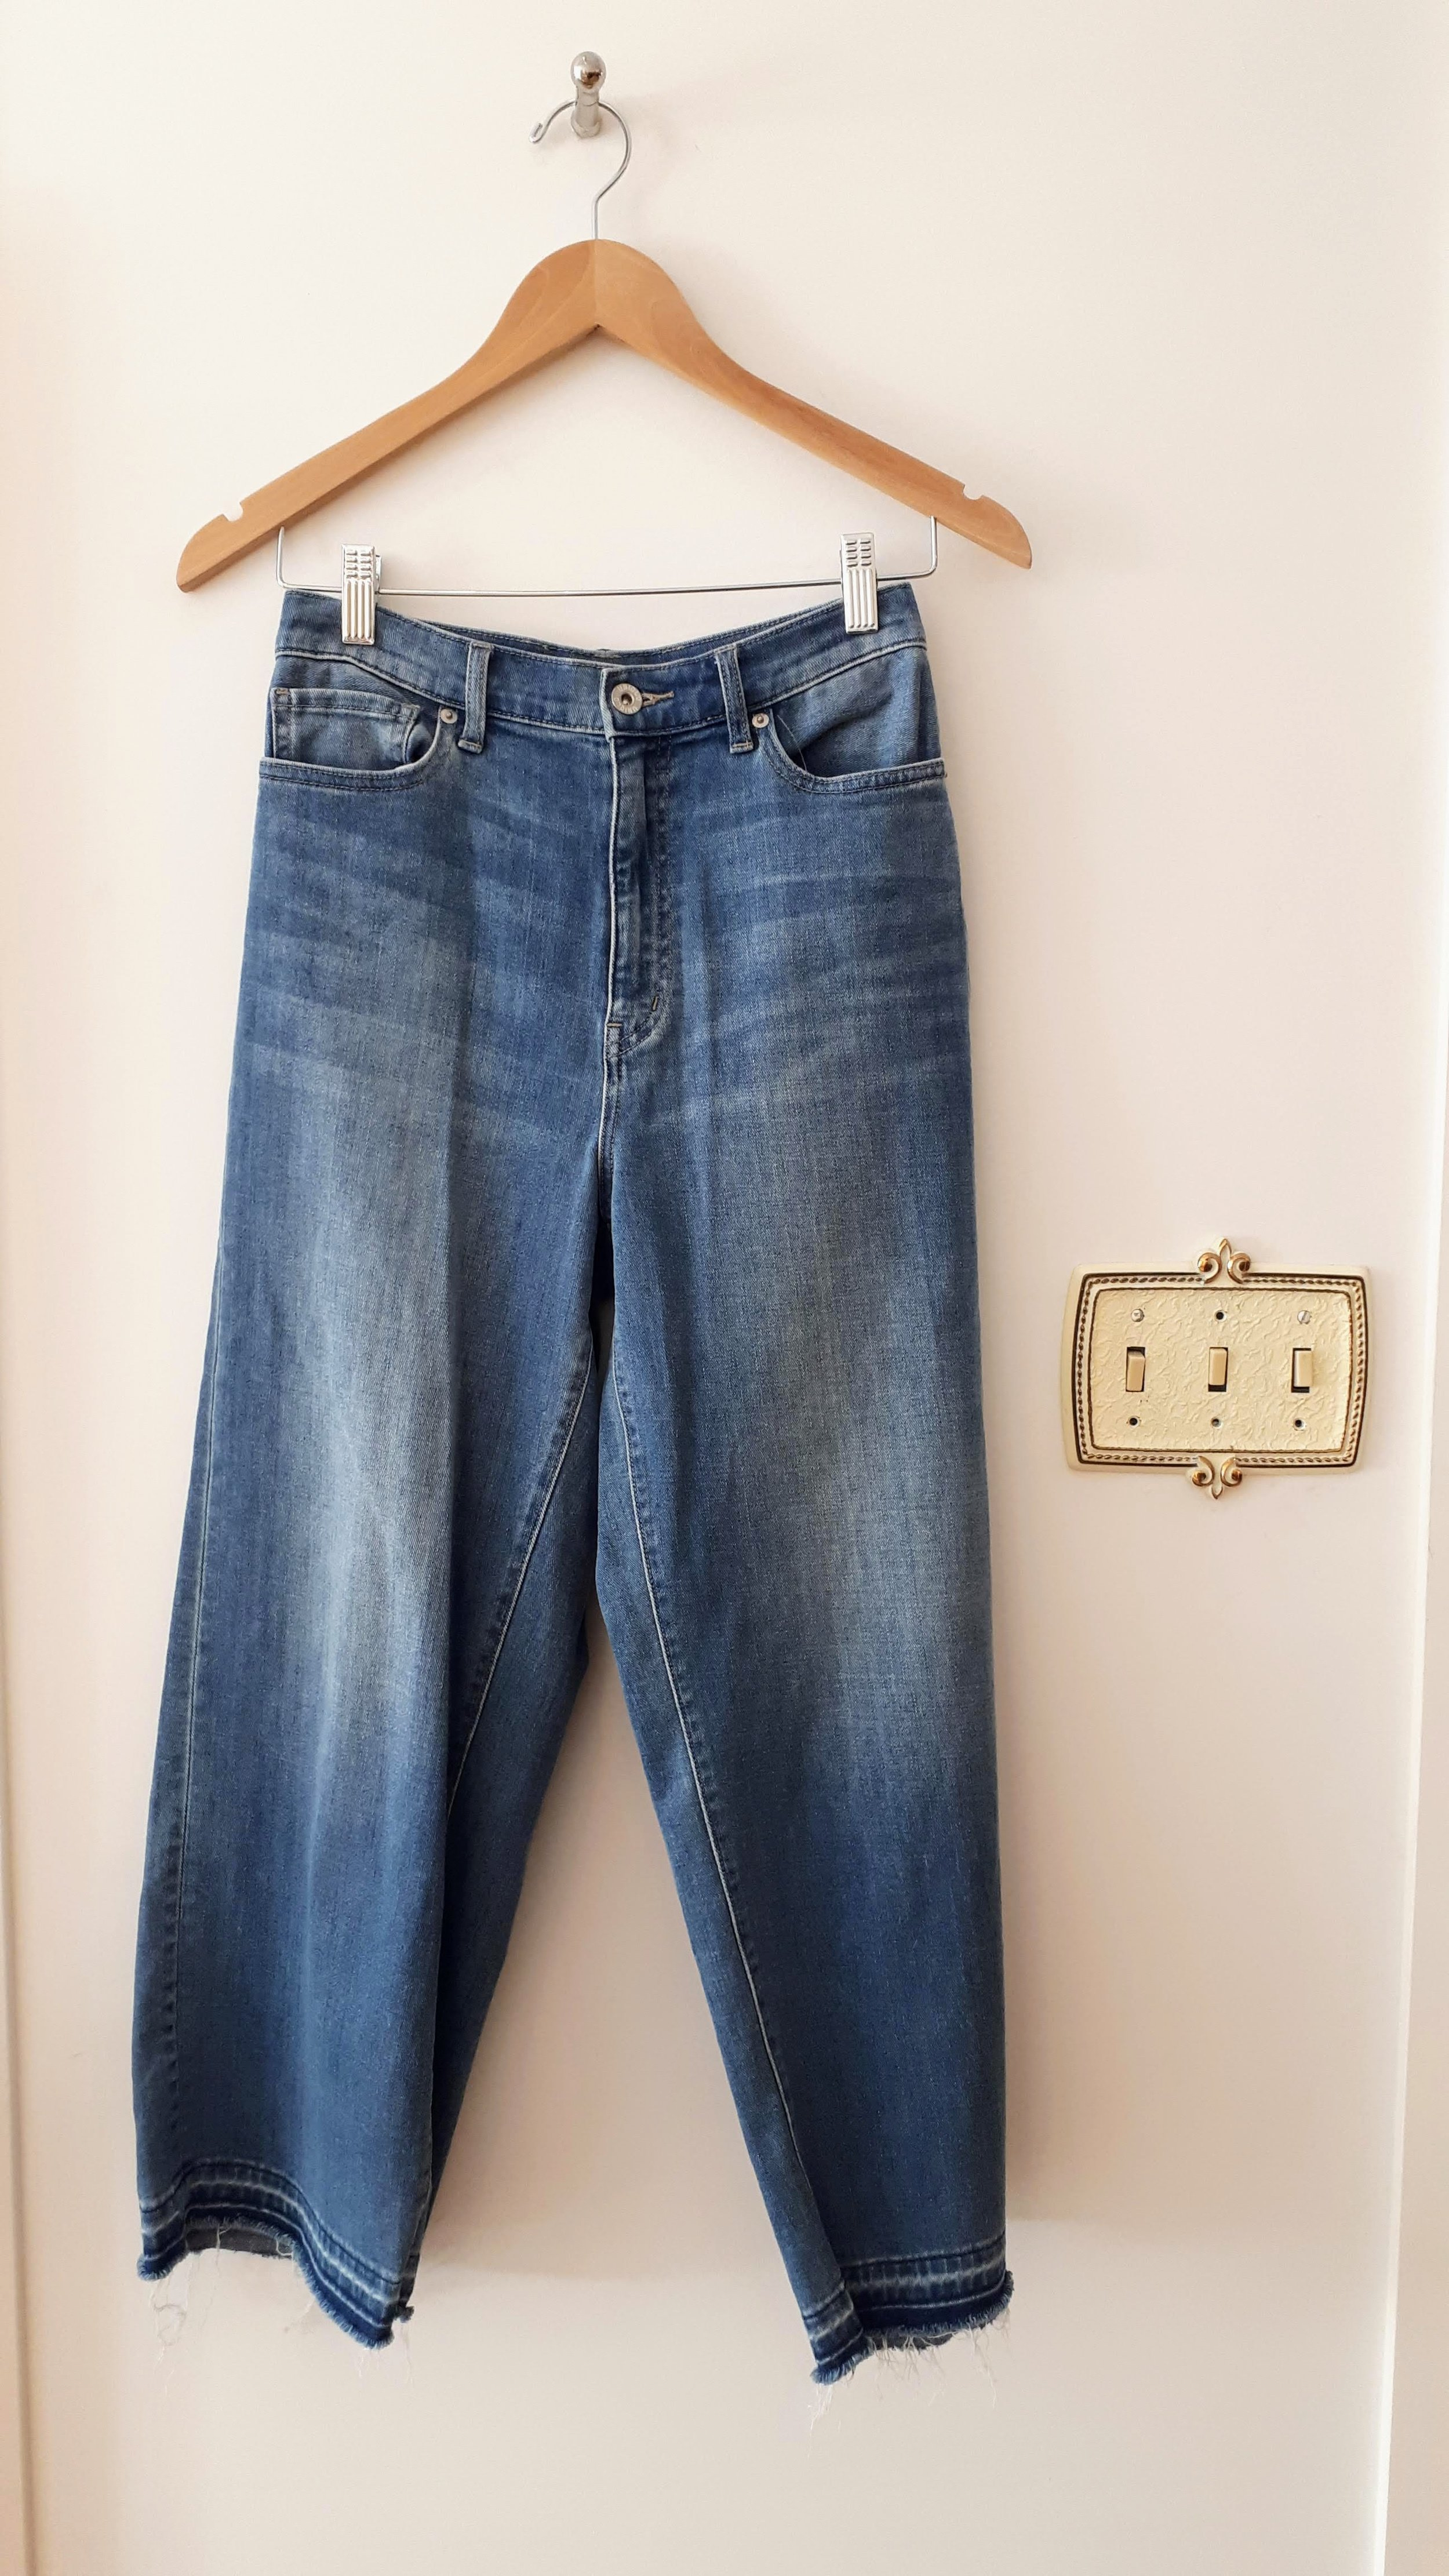 Uniqlo pants; Size 25, $36